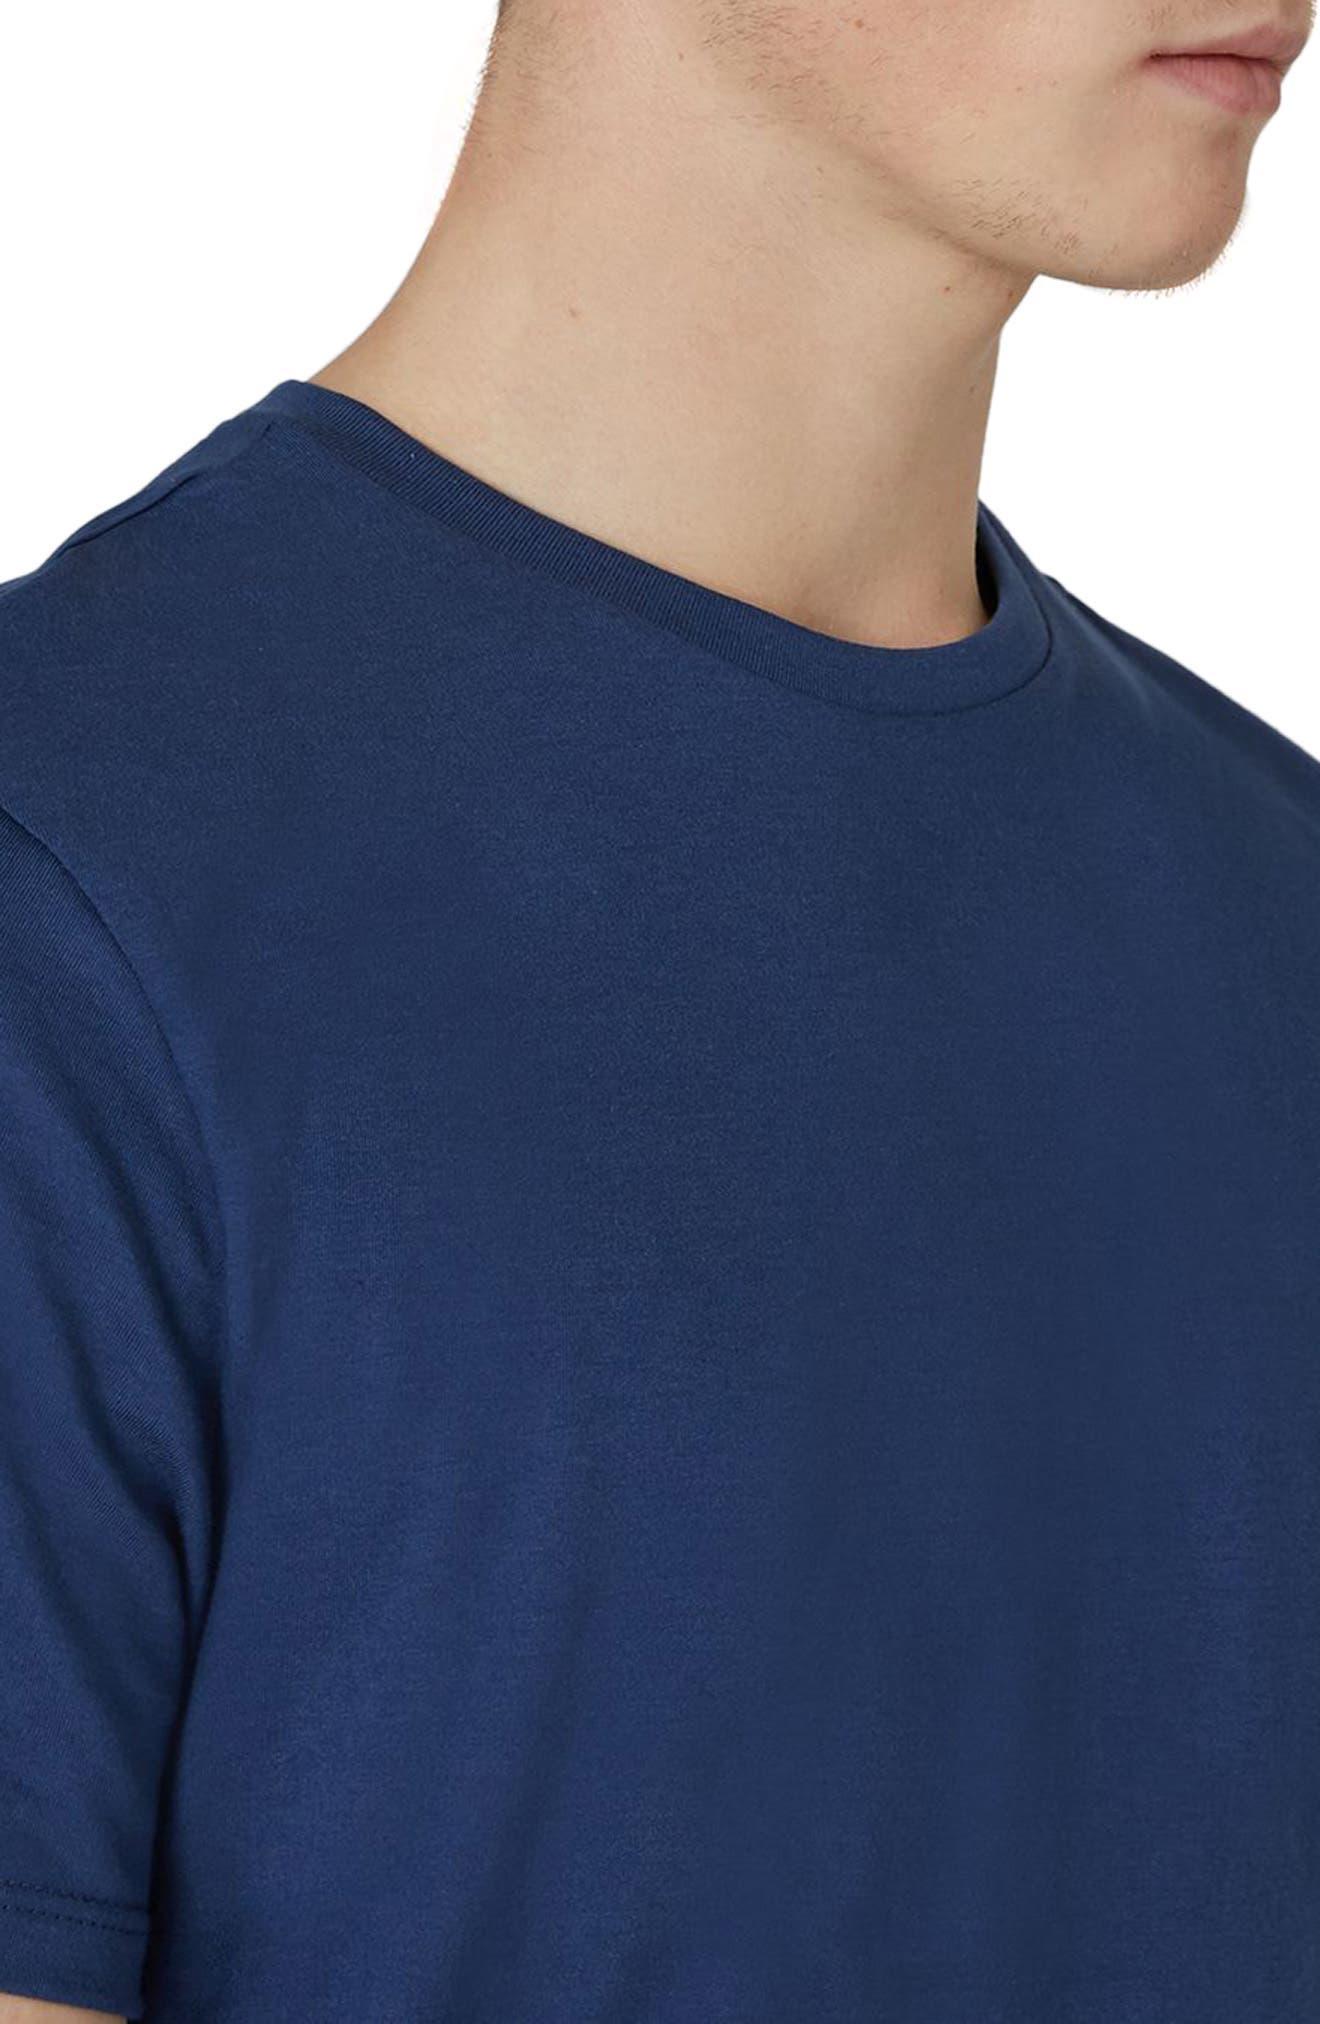 TOPMAN,                             Slim Fit Crewneck T-Shirt,                             Alternate thumbnail 3, color,                             450